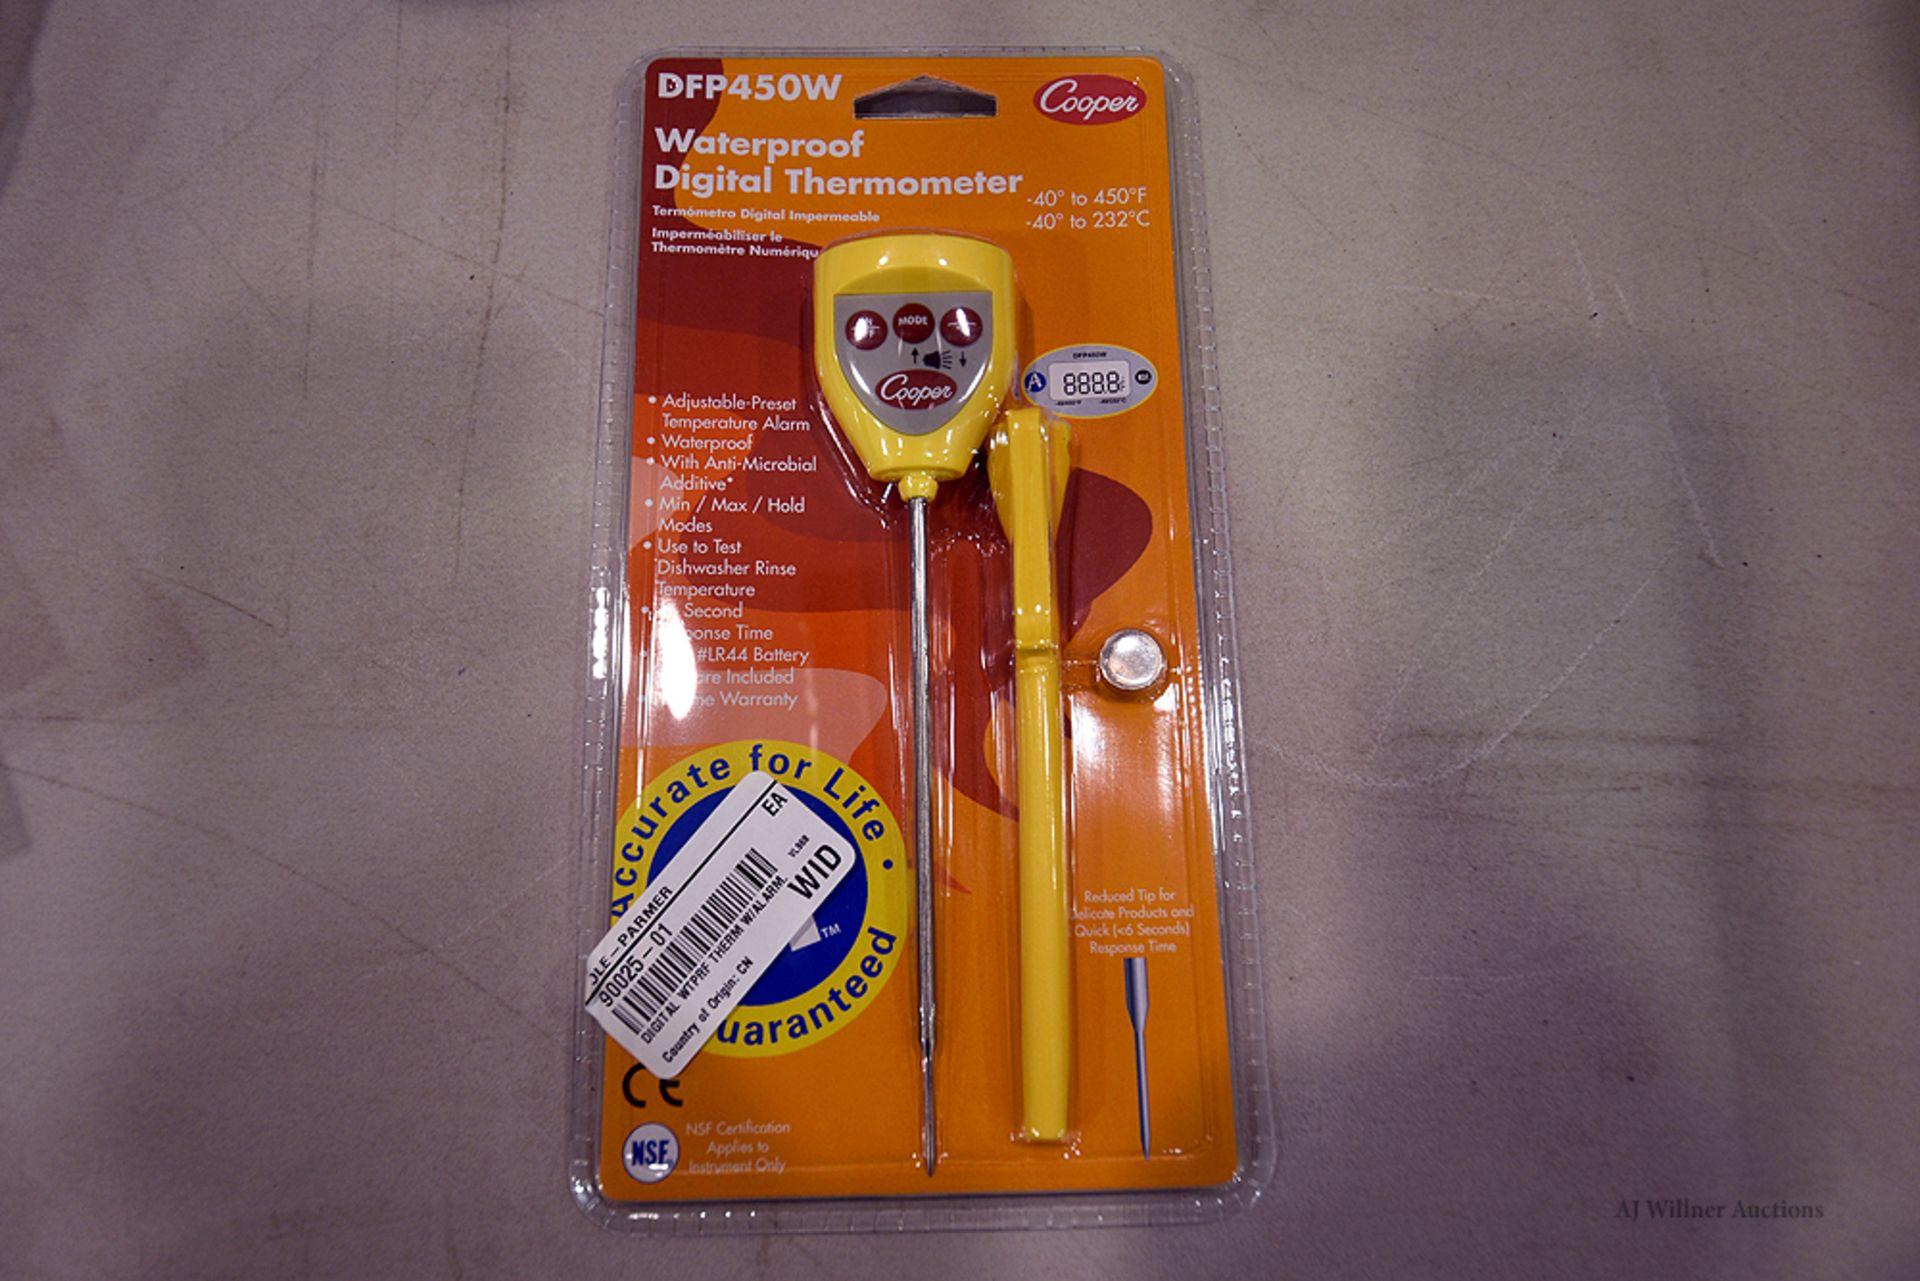 Lot 92 - Cooper, Waterproof Digital Thermometer, Model DFP450W